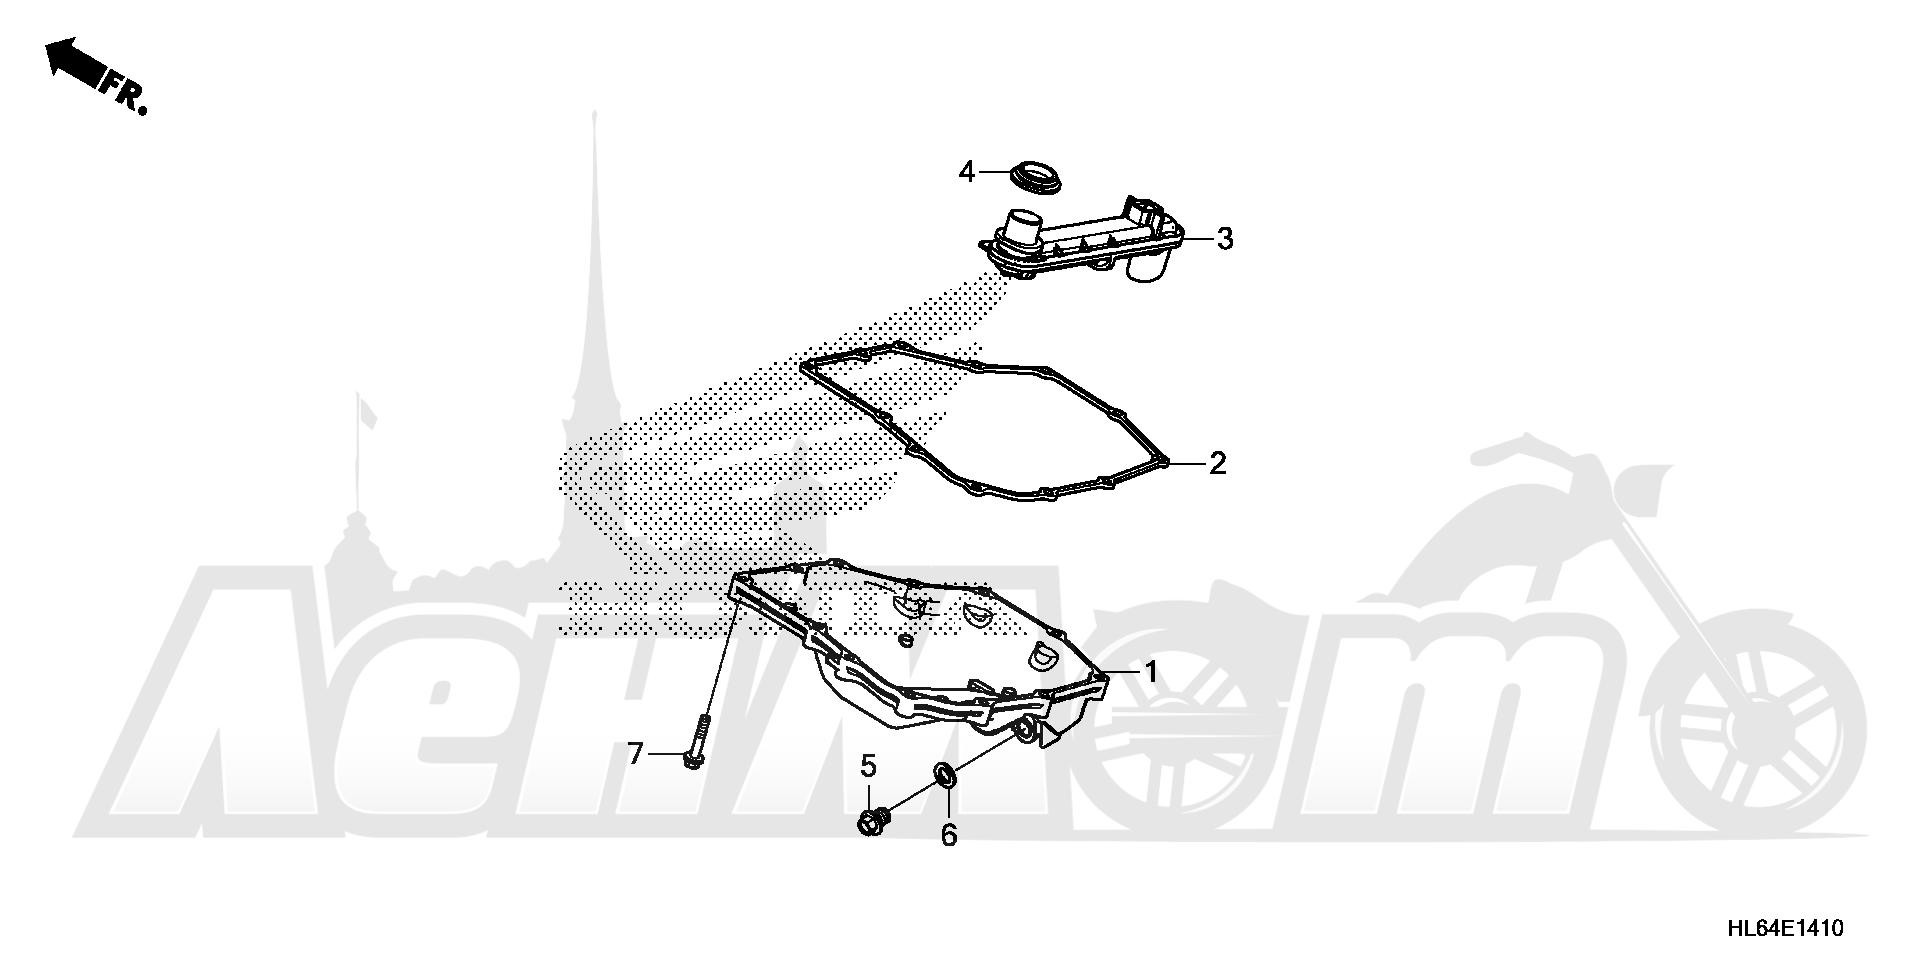 Запчасти для Квадроцикла Honda 2019 SXS1000S2X Раздел: OIL PAN | маслянный поддон